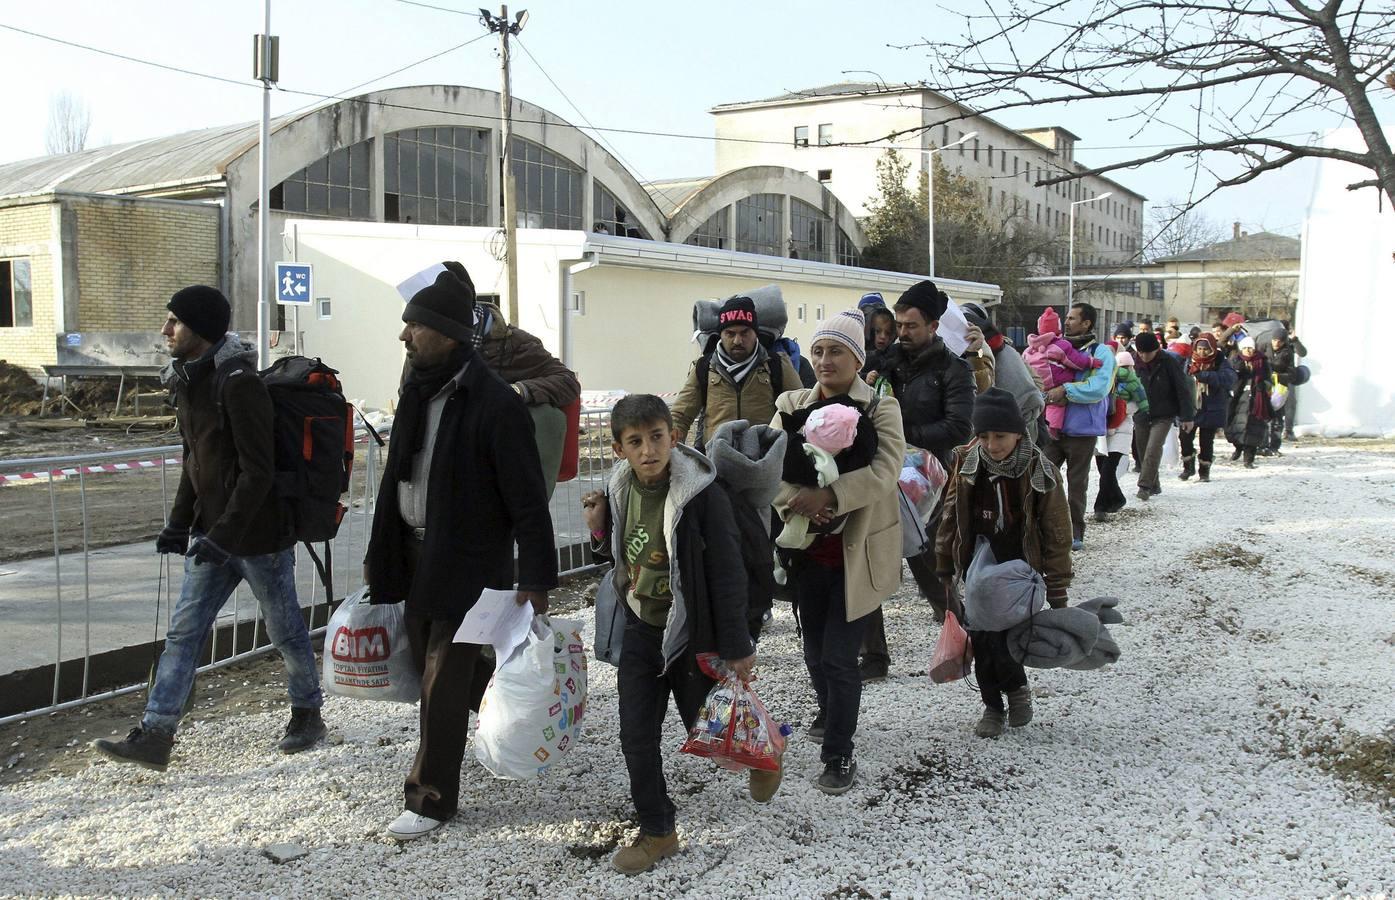 Suecia decide expulsar a 80.000 refugiados solicitantes de asilo